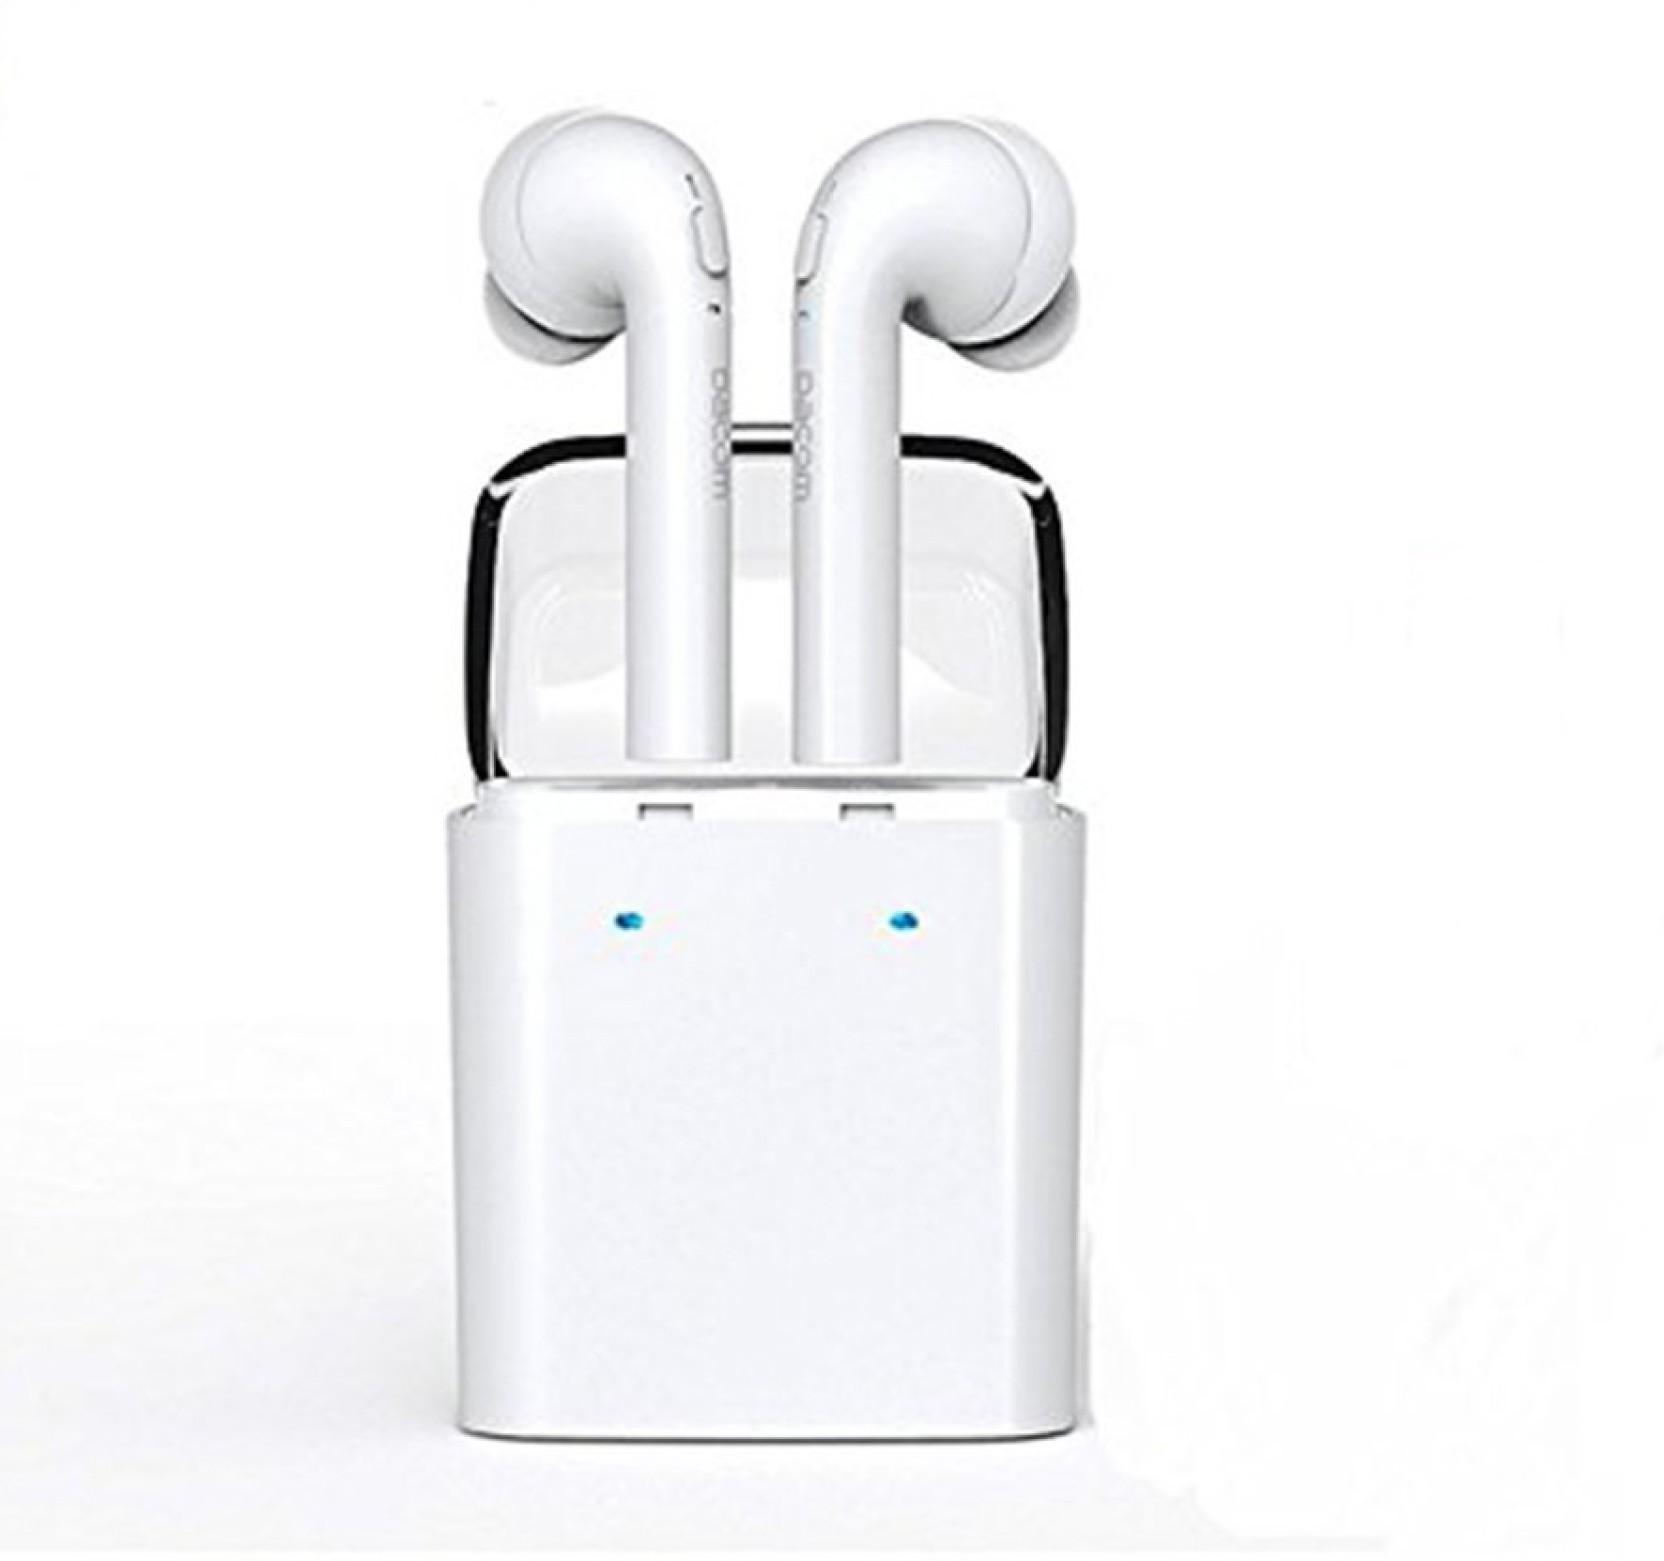 Ibs Wireless Airpods Stealth Mini Twin Portable Bluetooth Headset Professional Samsung Sony Asus Xiaomi Oppo Lenovo Vivo Compare